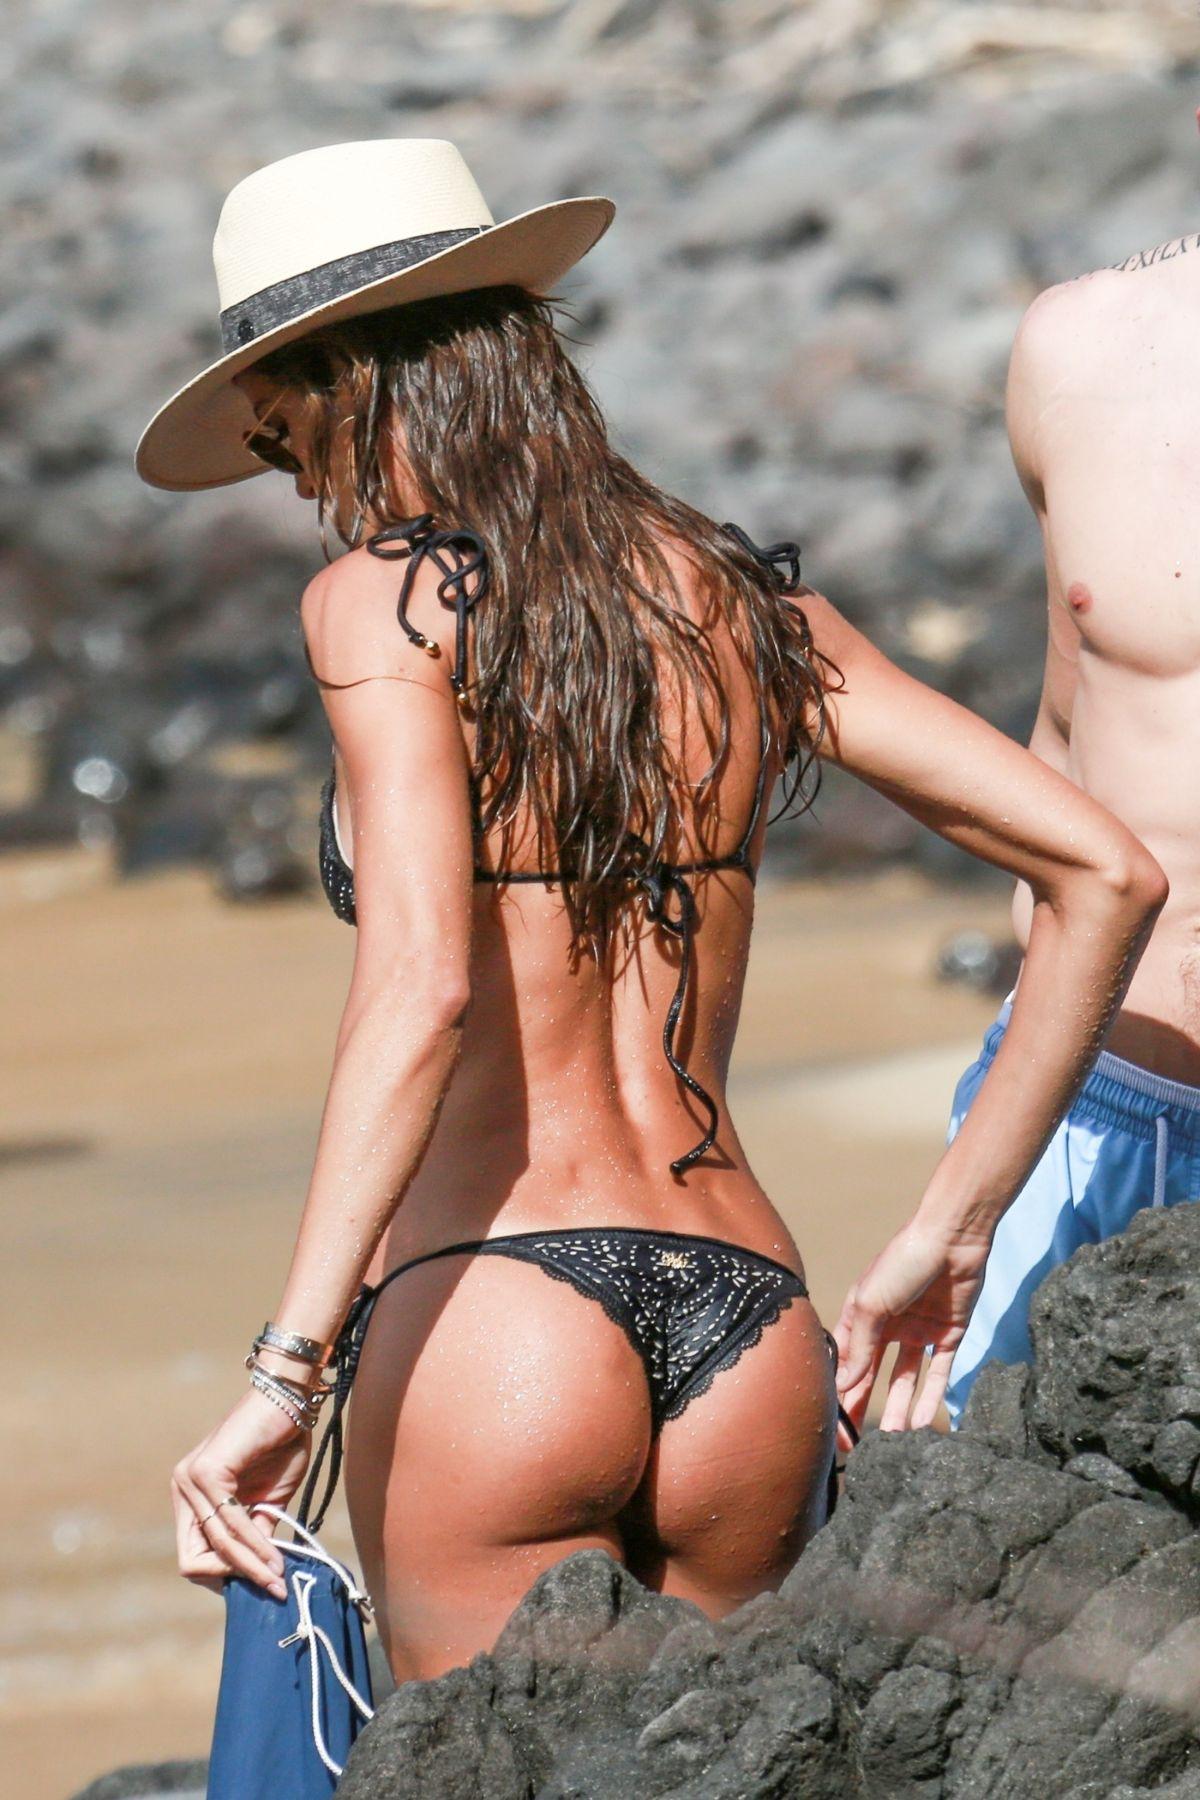 Izabel Goulart in Bikini and Kevin Trapp on the beach in Fernando de Noronha Pic 12 of 35